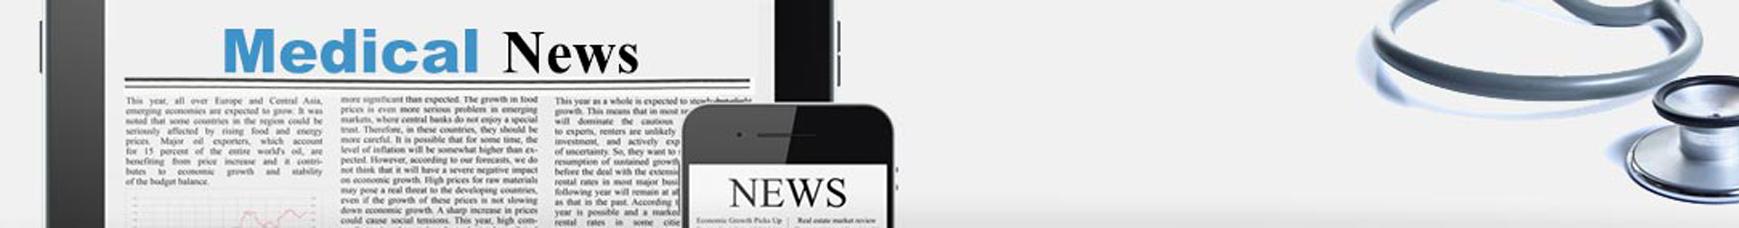 Medical News Banner